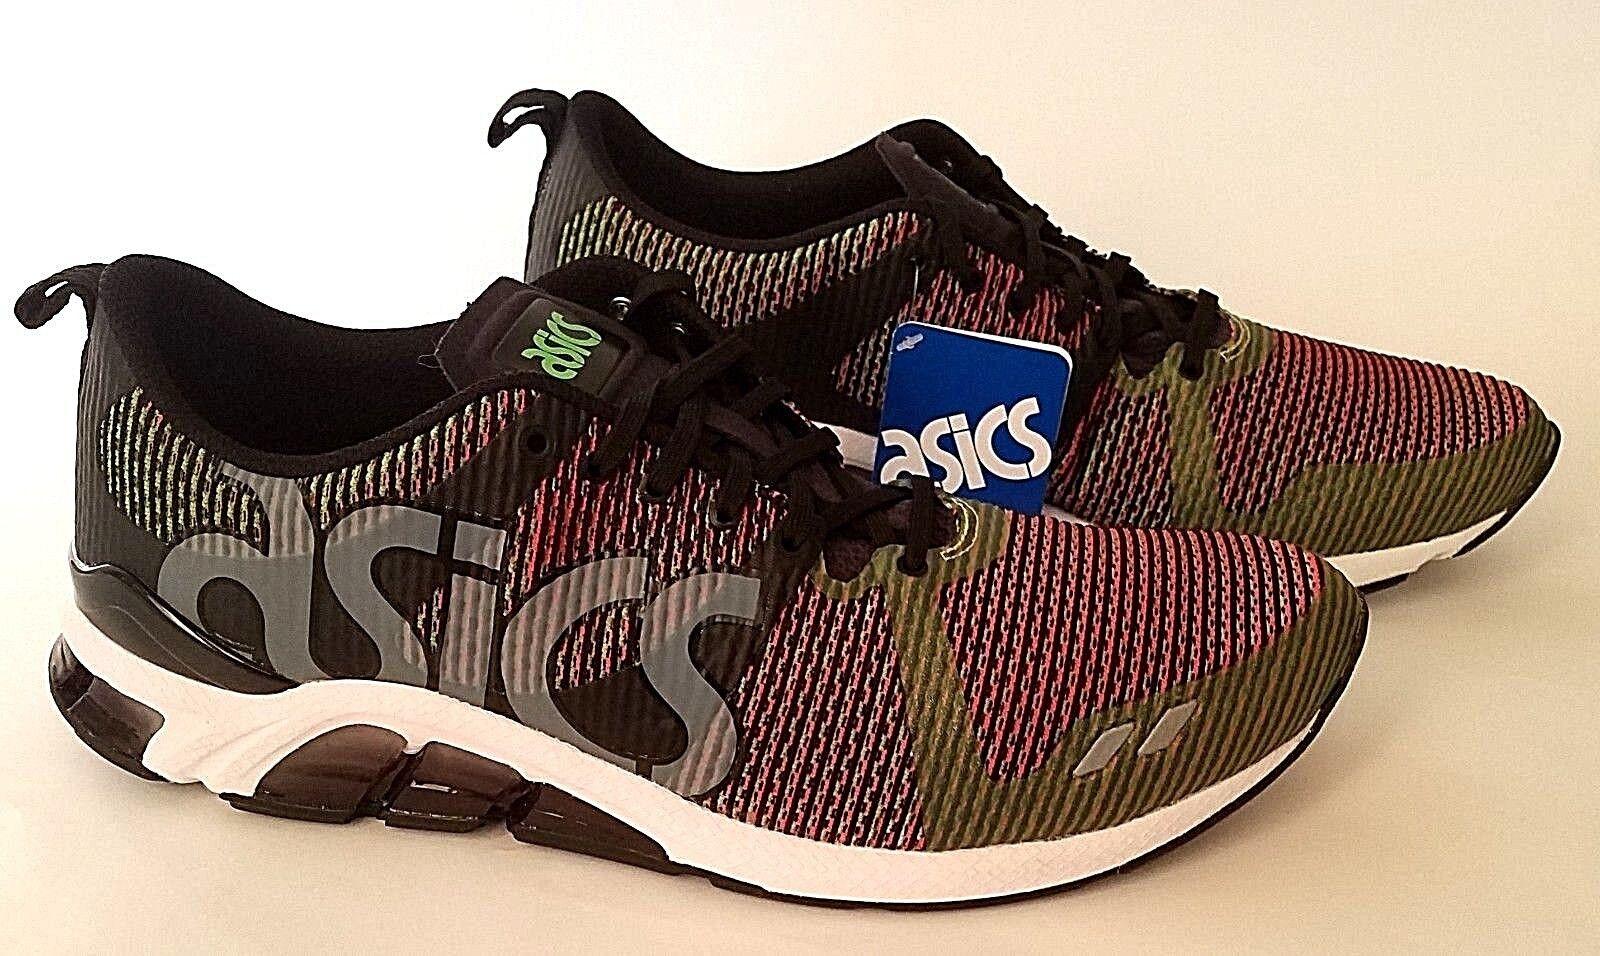 ASICS Mens Gel-Lyte One Eighty Fashion Sneaker, Gecko Green/Guava, 12 M US